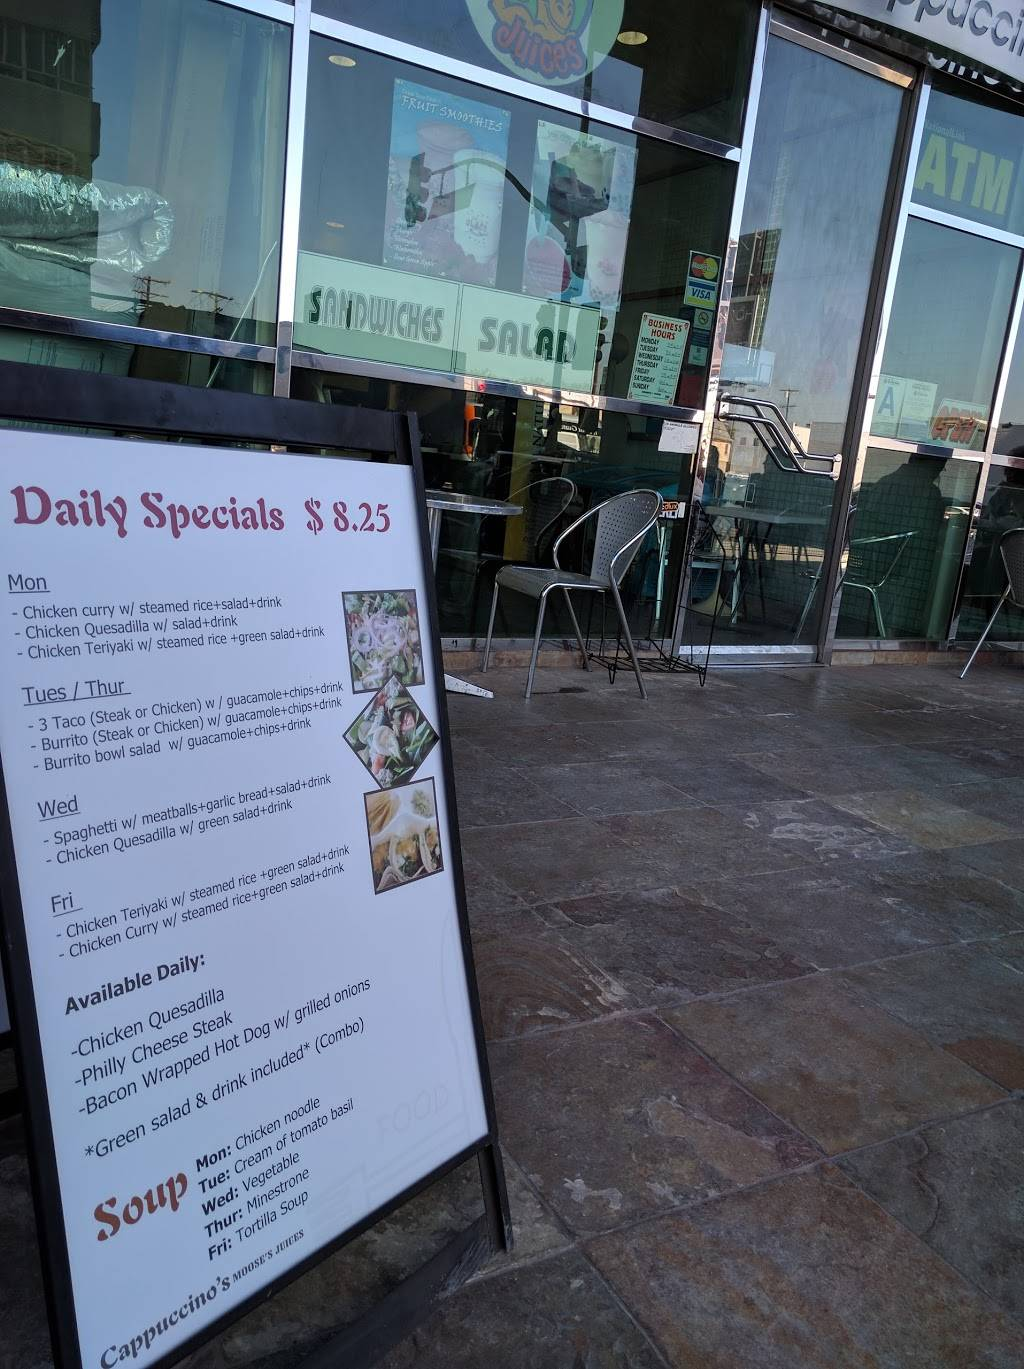 Cappuccinos   restaurant   6380 Wilshire Blvd # 130, Los Angeles, CA 90048, USA   3236556583 OR +1 323-655-6583